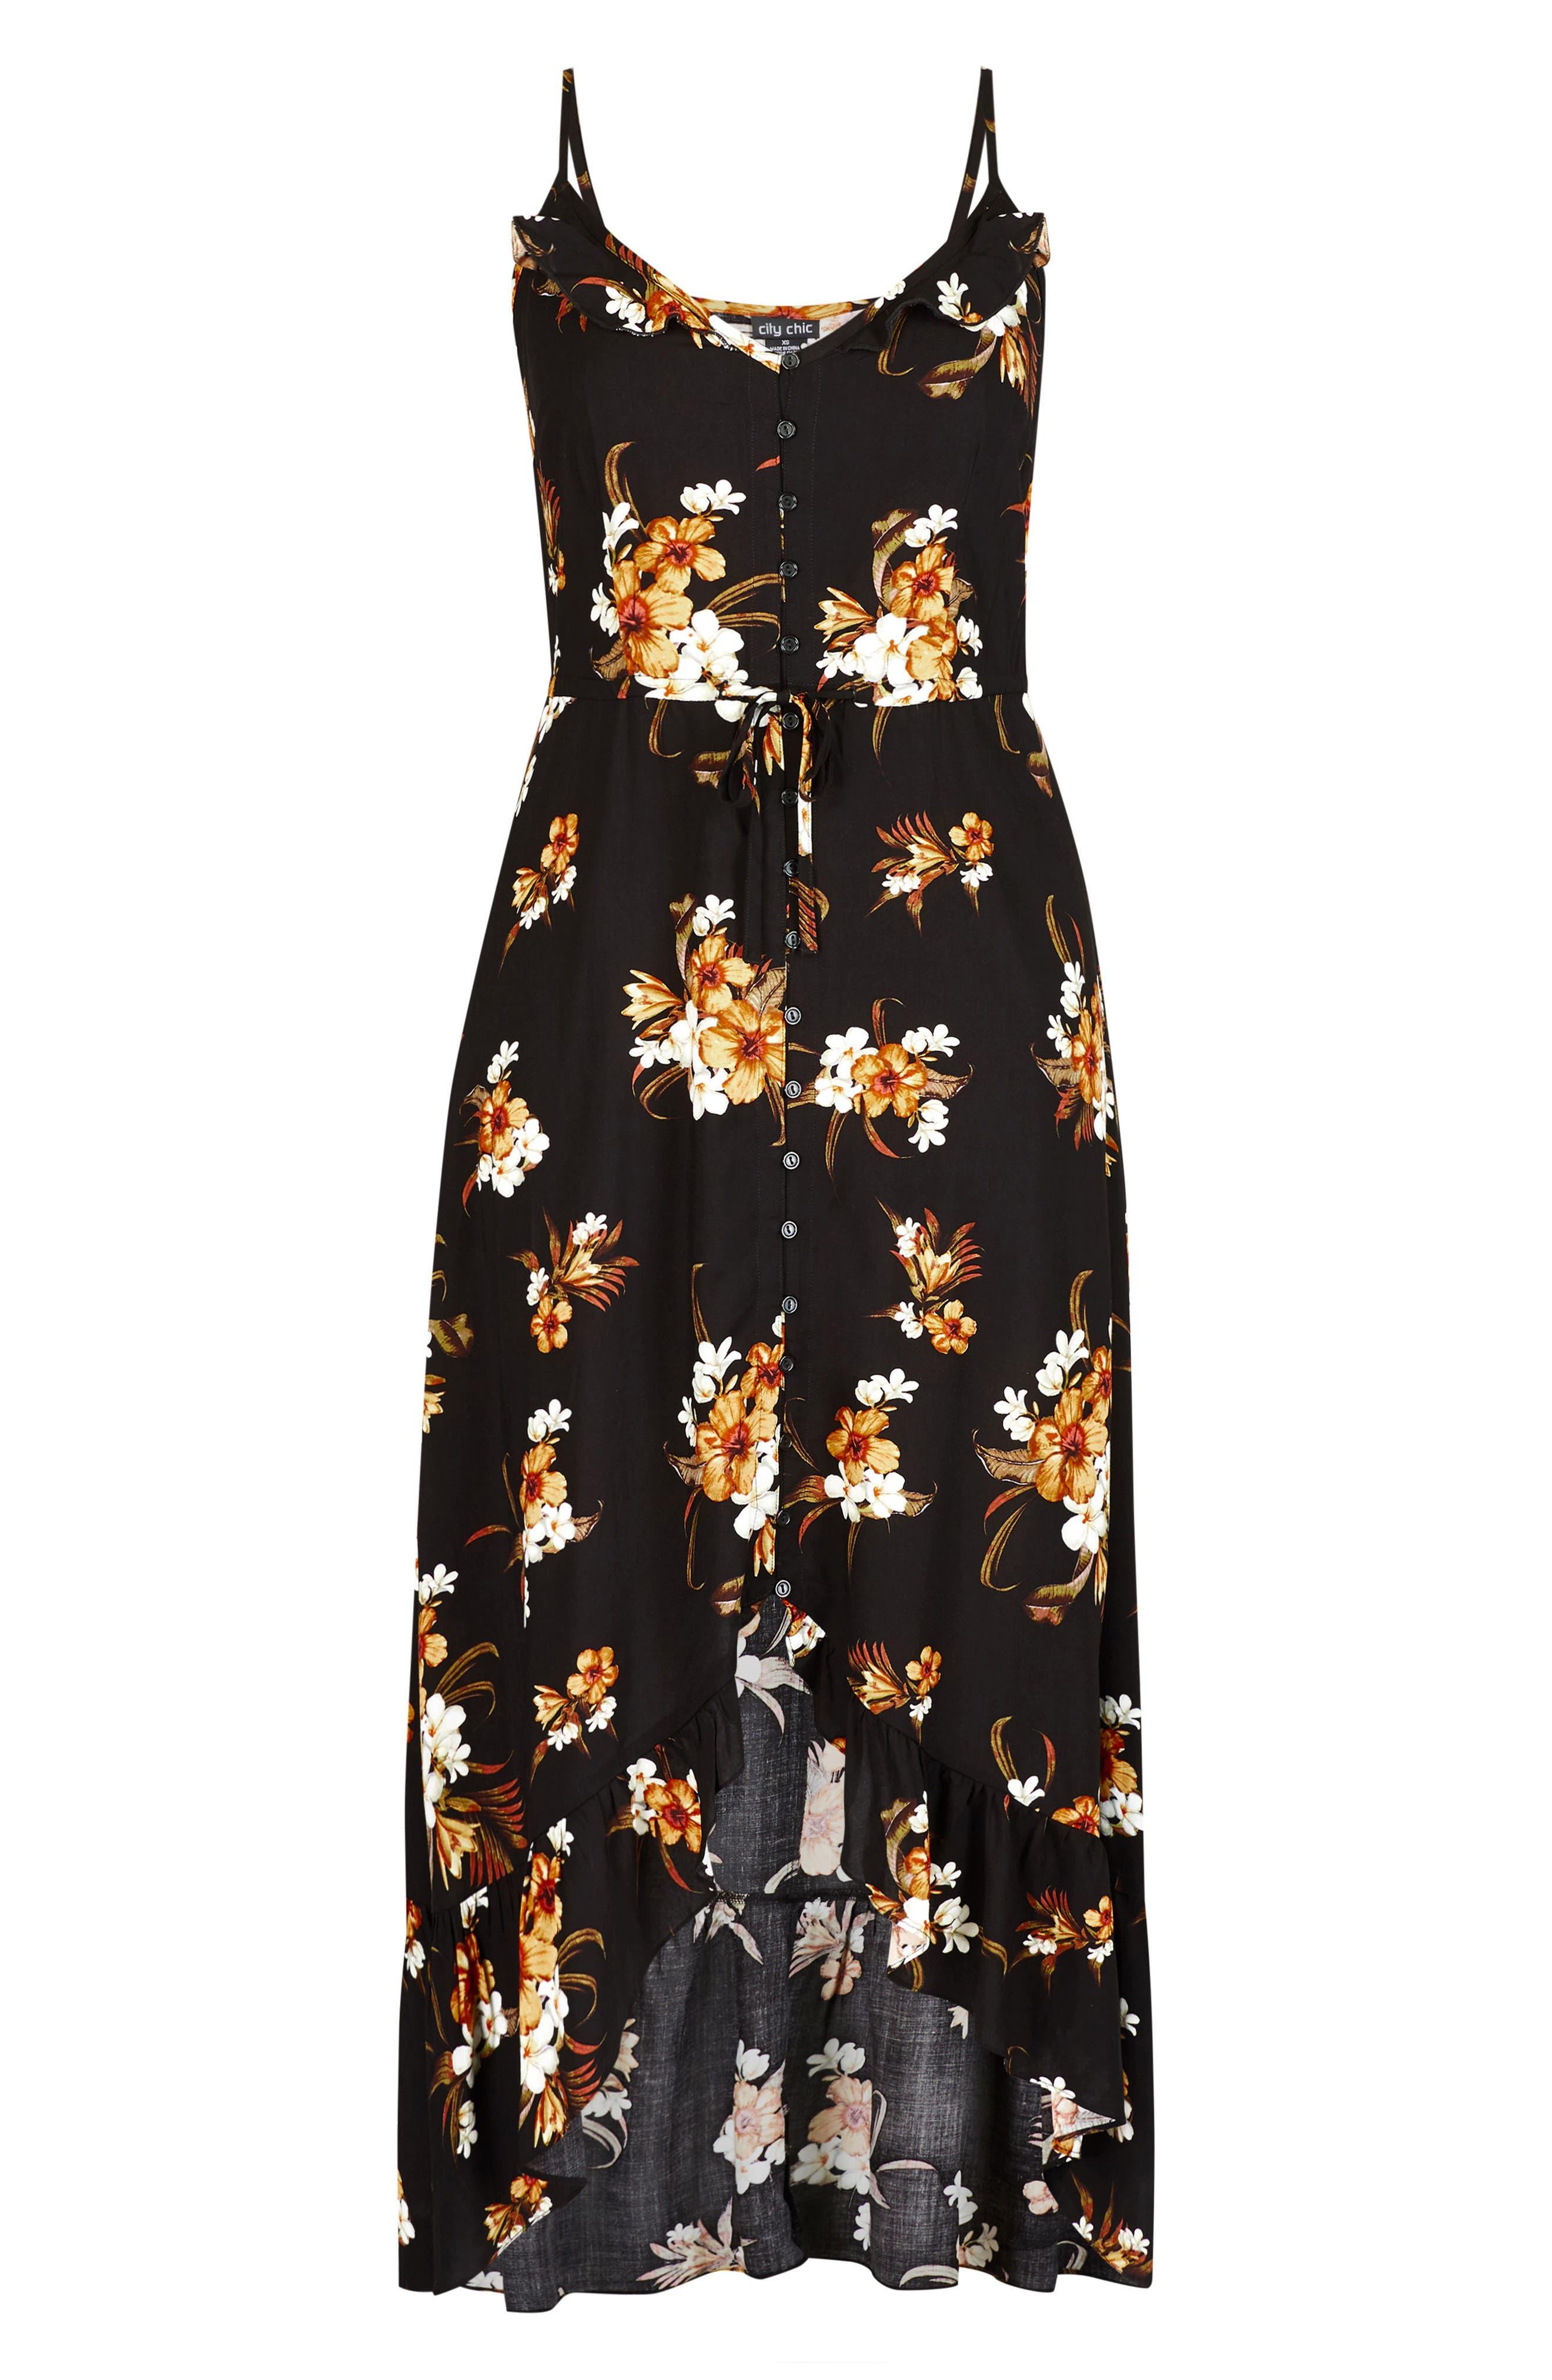 Aruba Floral Maxi Dress,                             Alternate thumbnail 3, color,                             BLACK PRINT